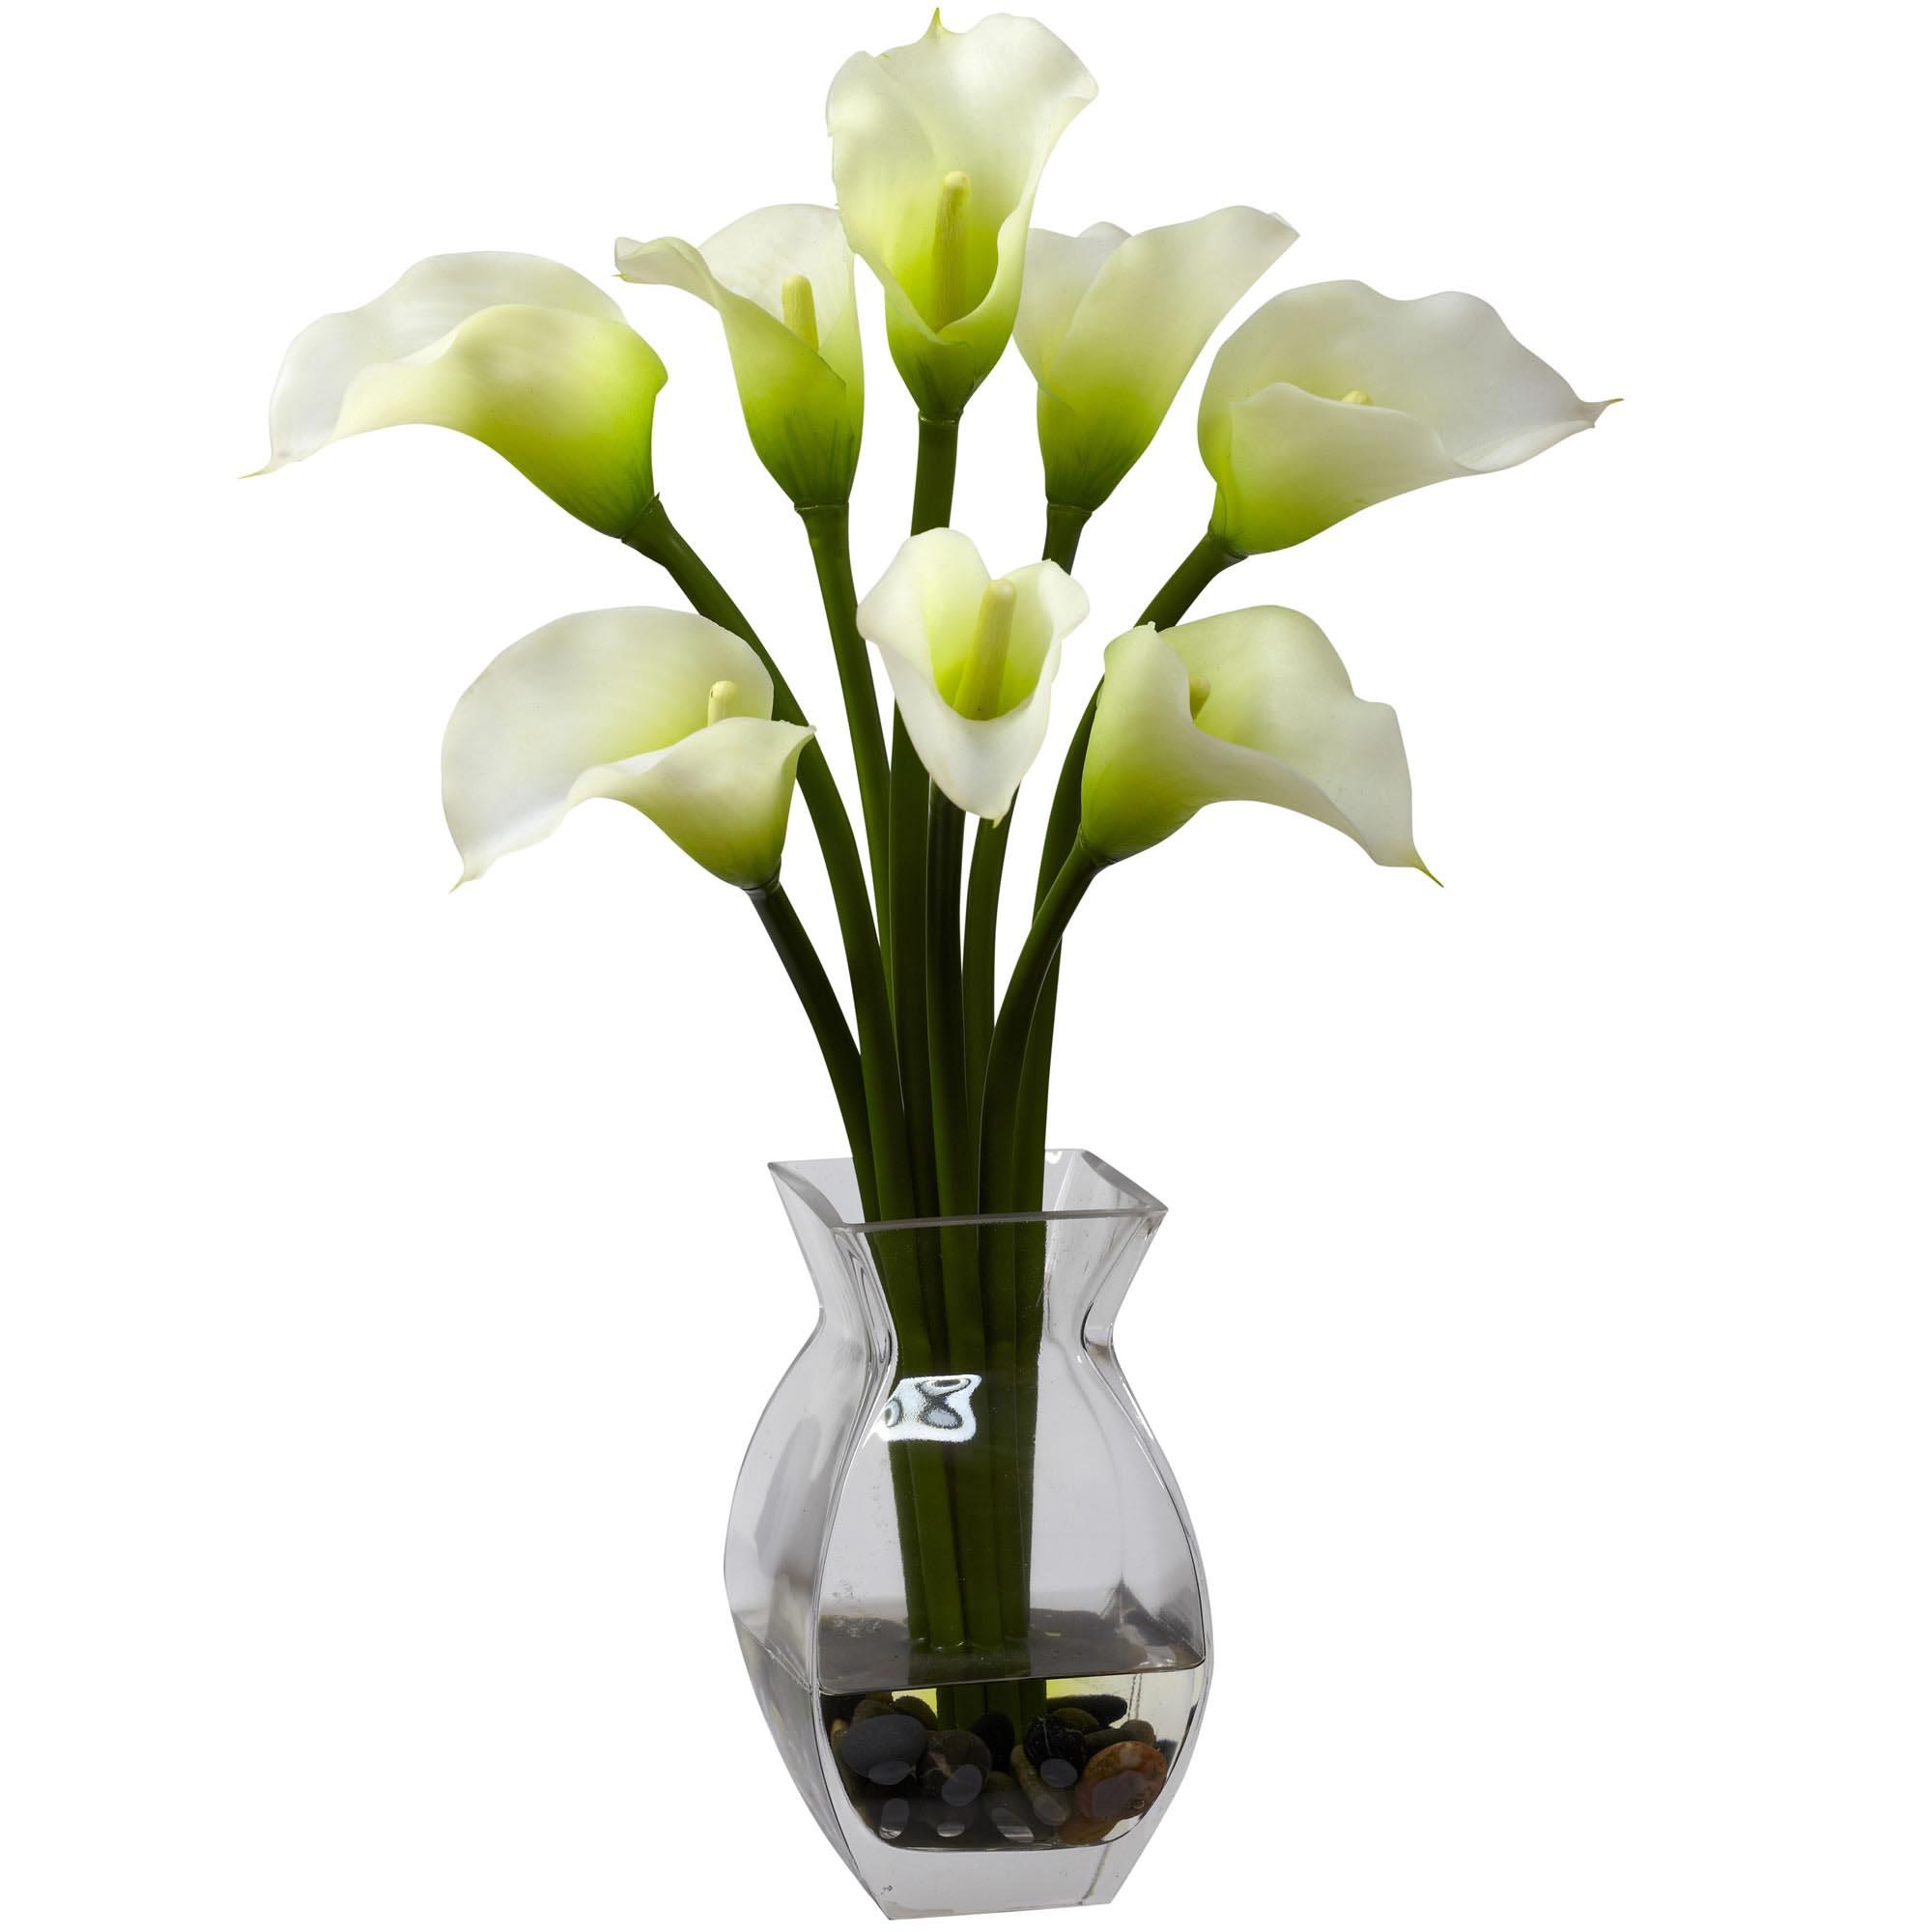 Calla lilly silk flower arrangement in acrylic water 1118 16 inch silk classic calla lily arrangement in vase dhlflorist Images